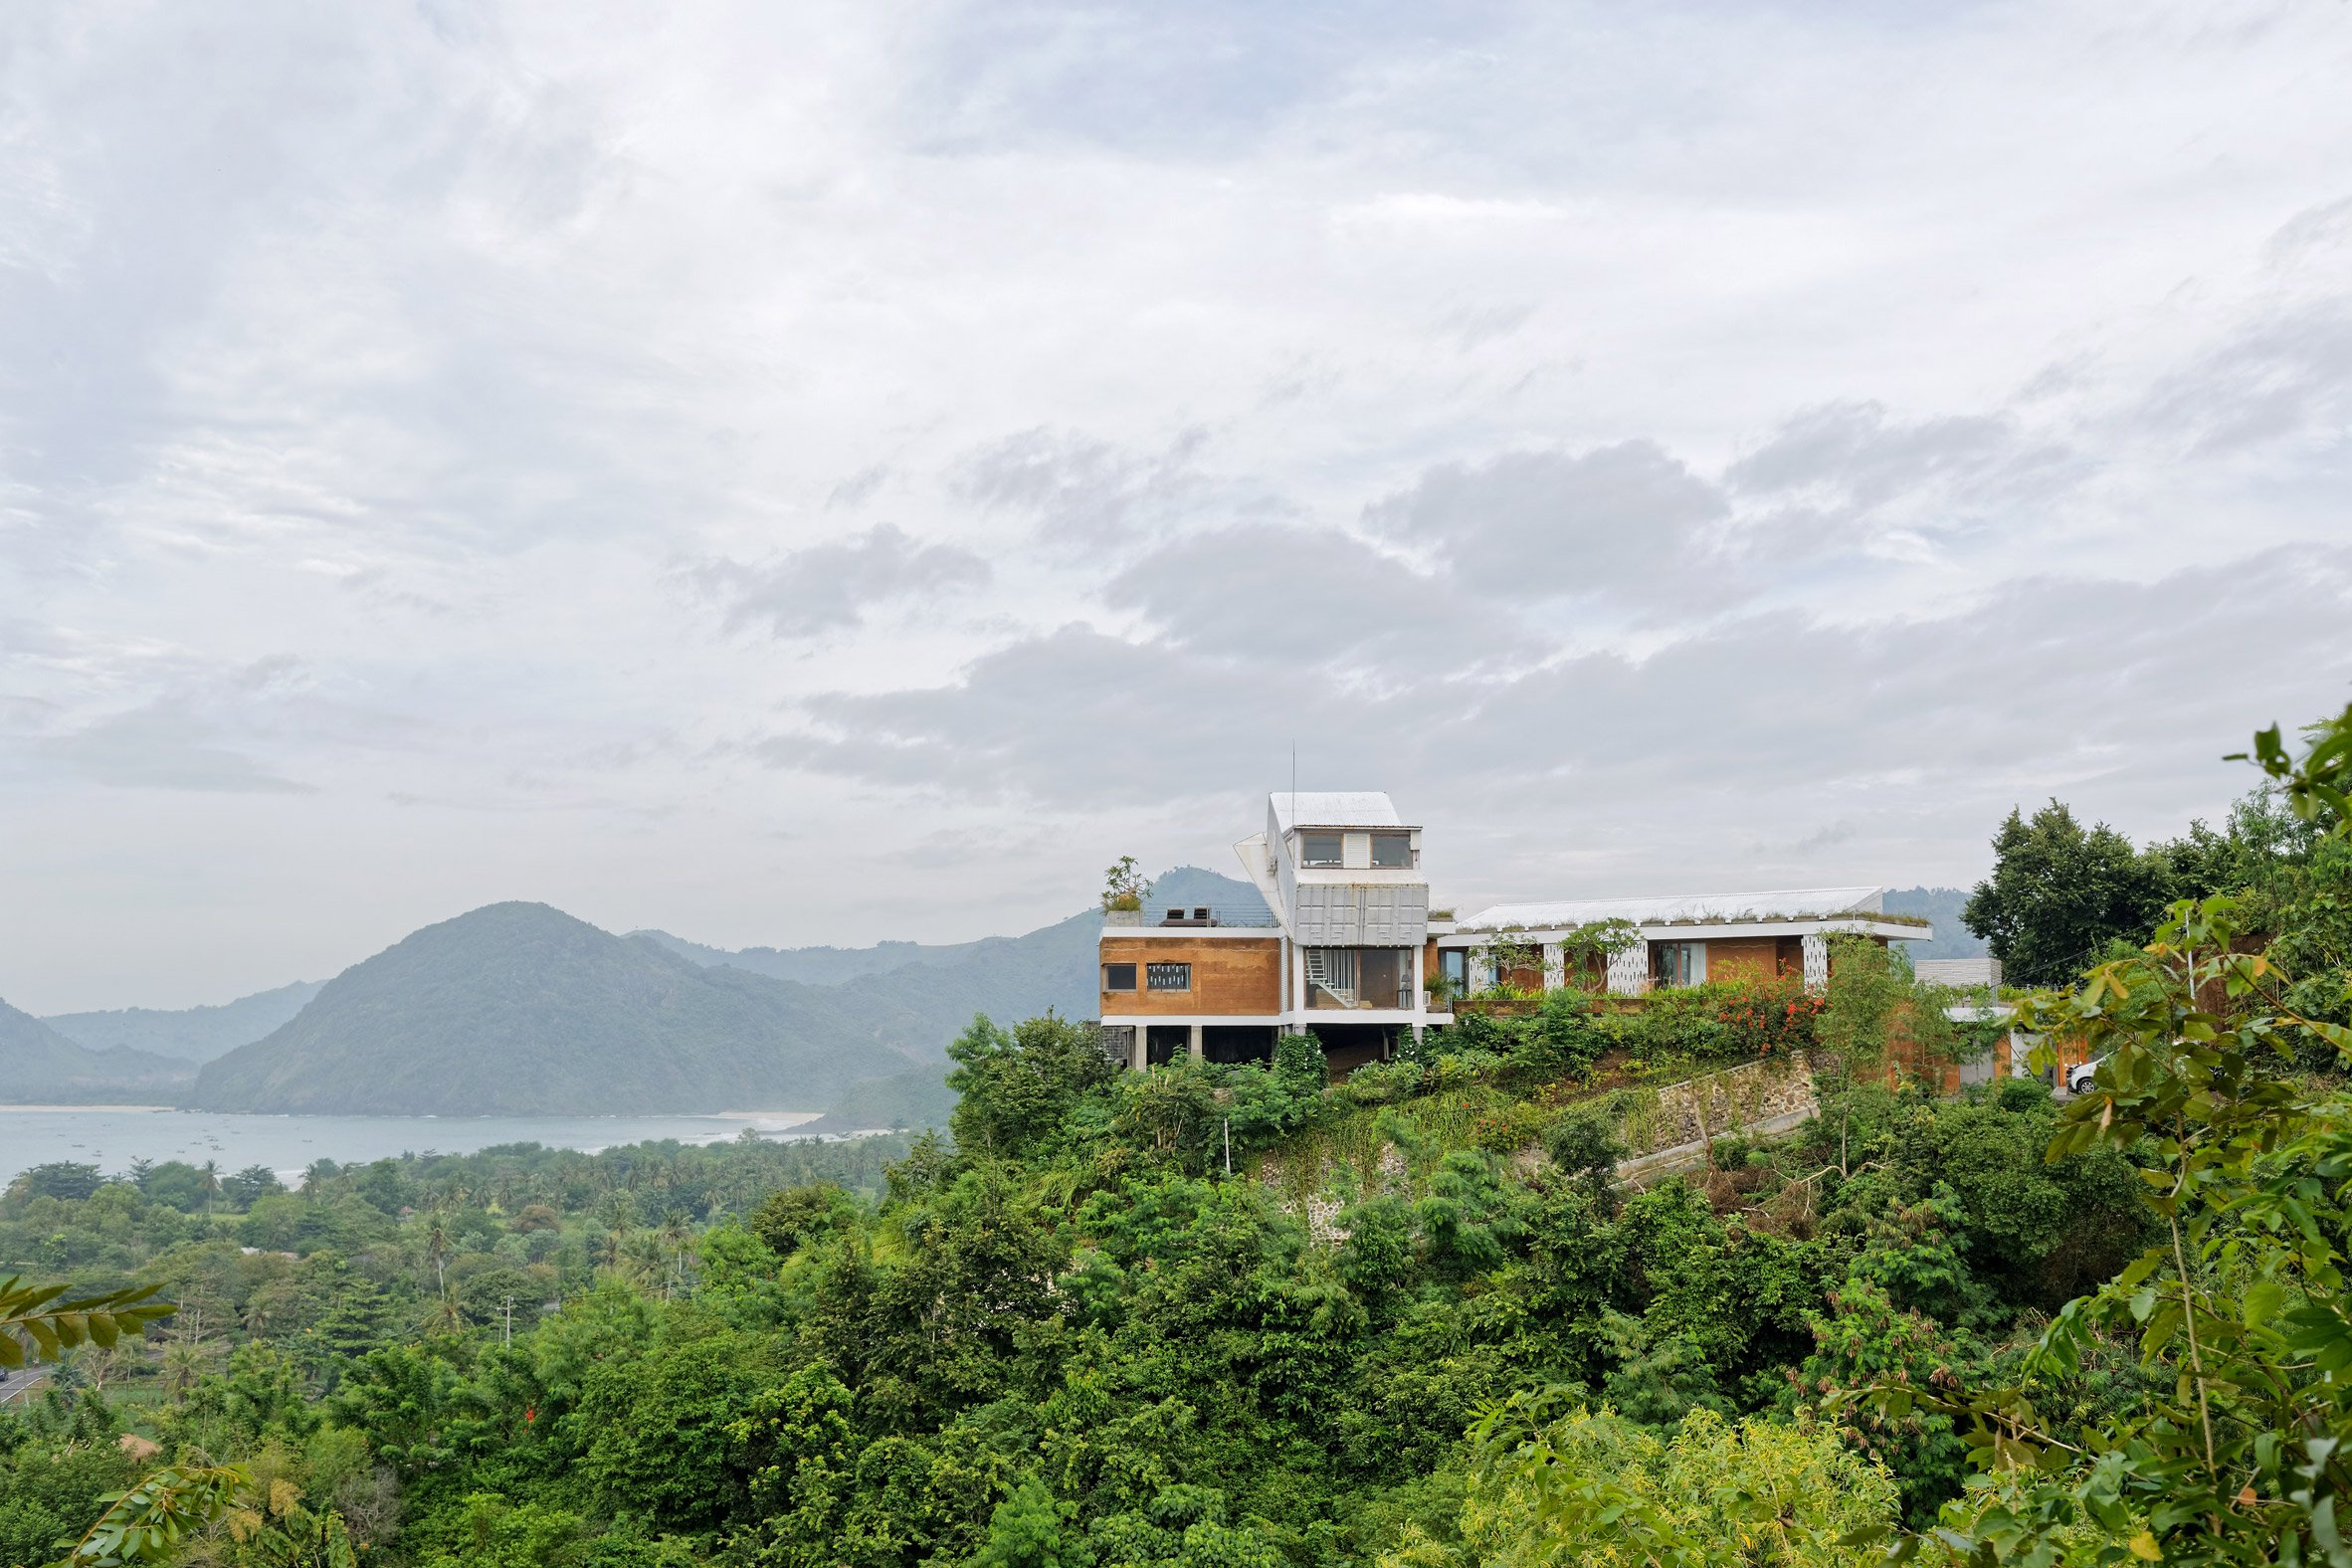 clay-house-budi-pradono-architects-architecture_dezeen_2364_col_6.jpg